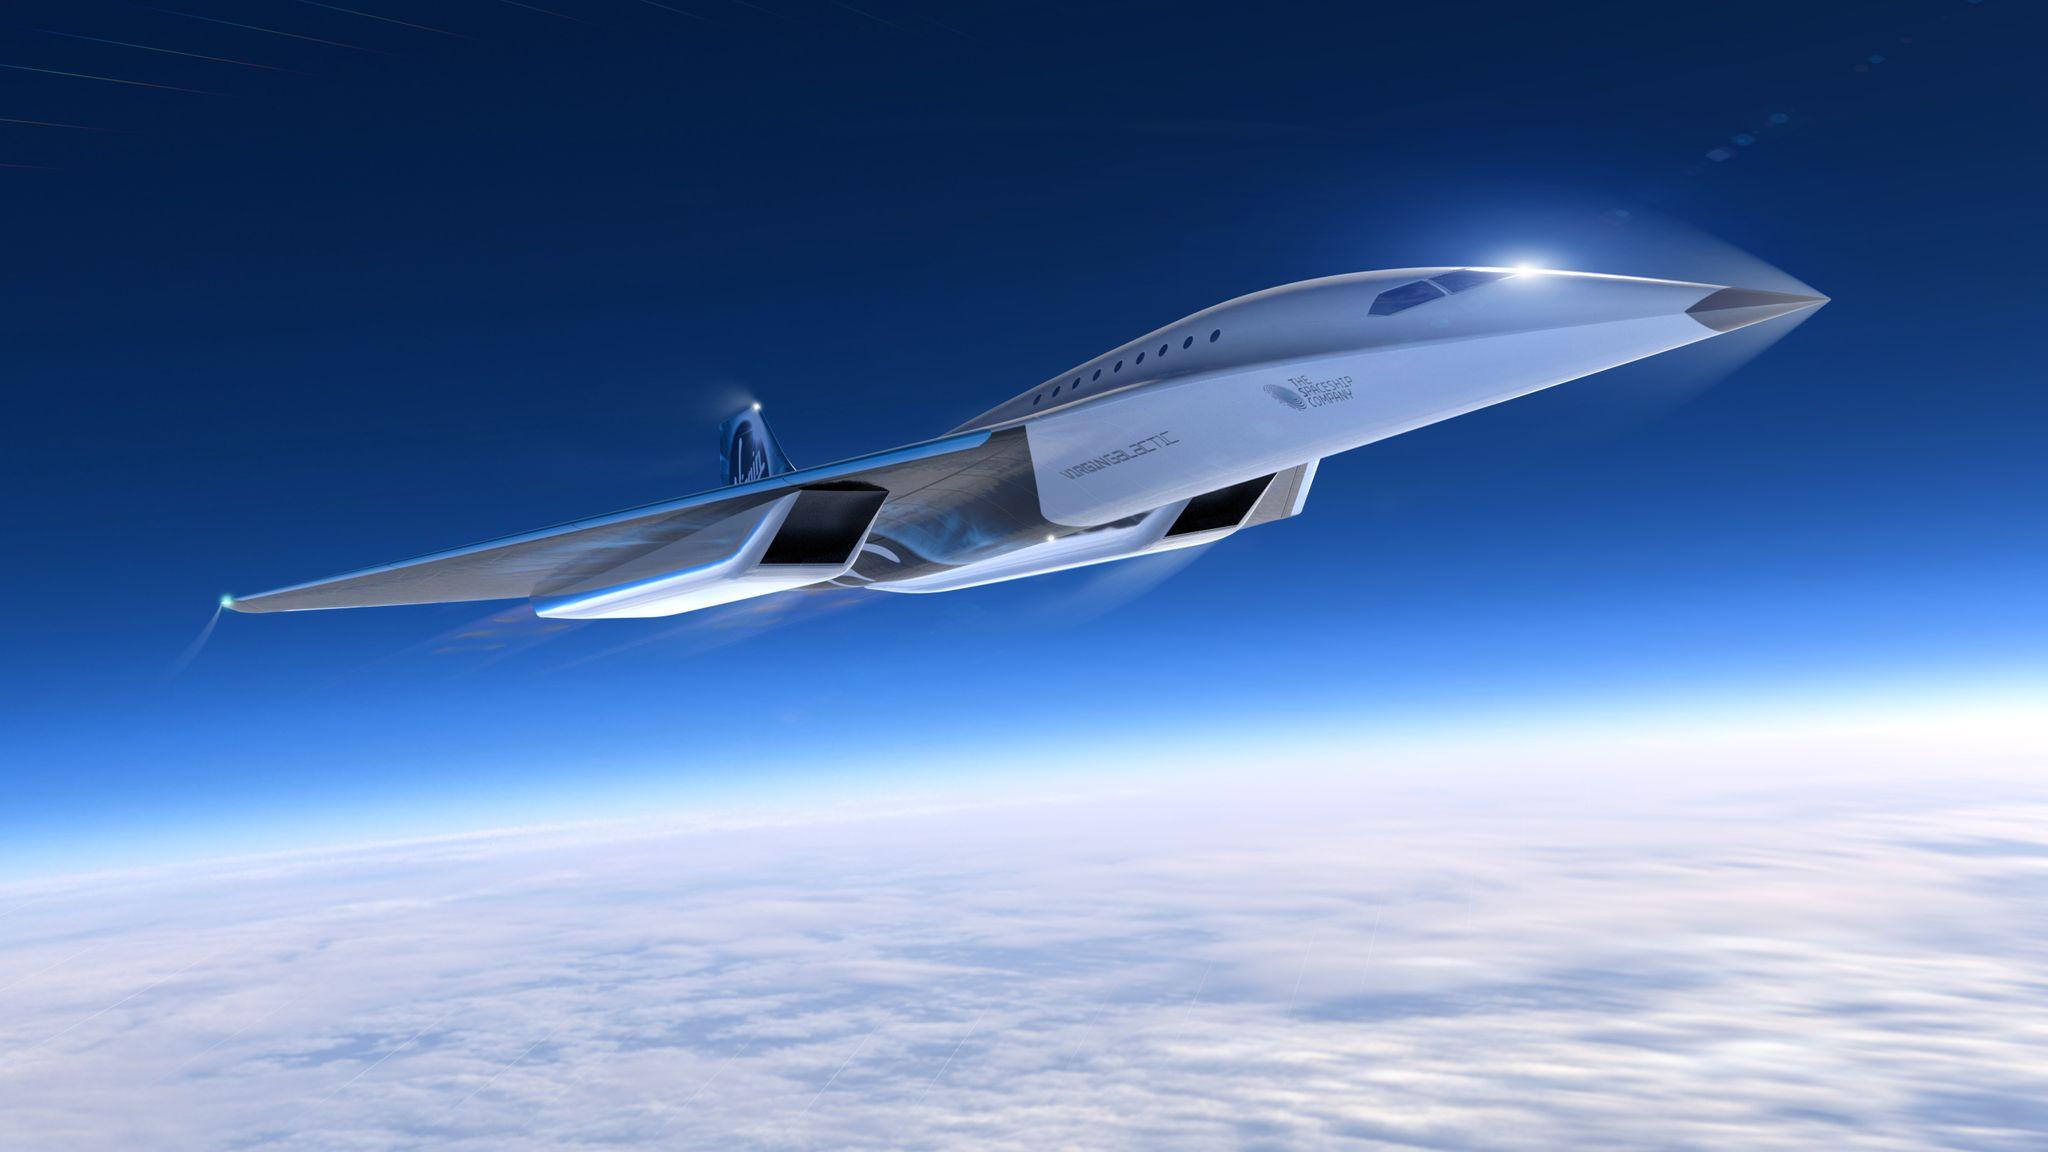 کانسپت سریعترین هواپیمای جهان